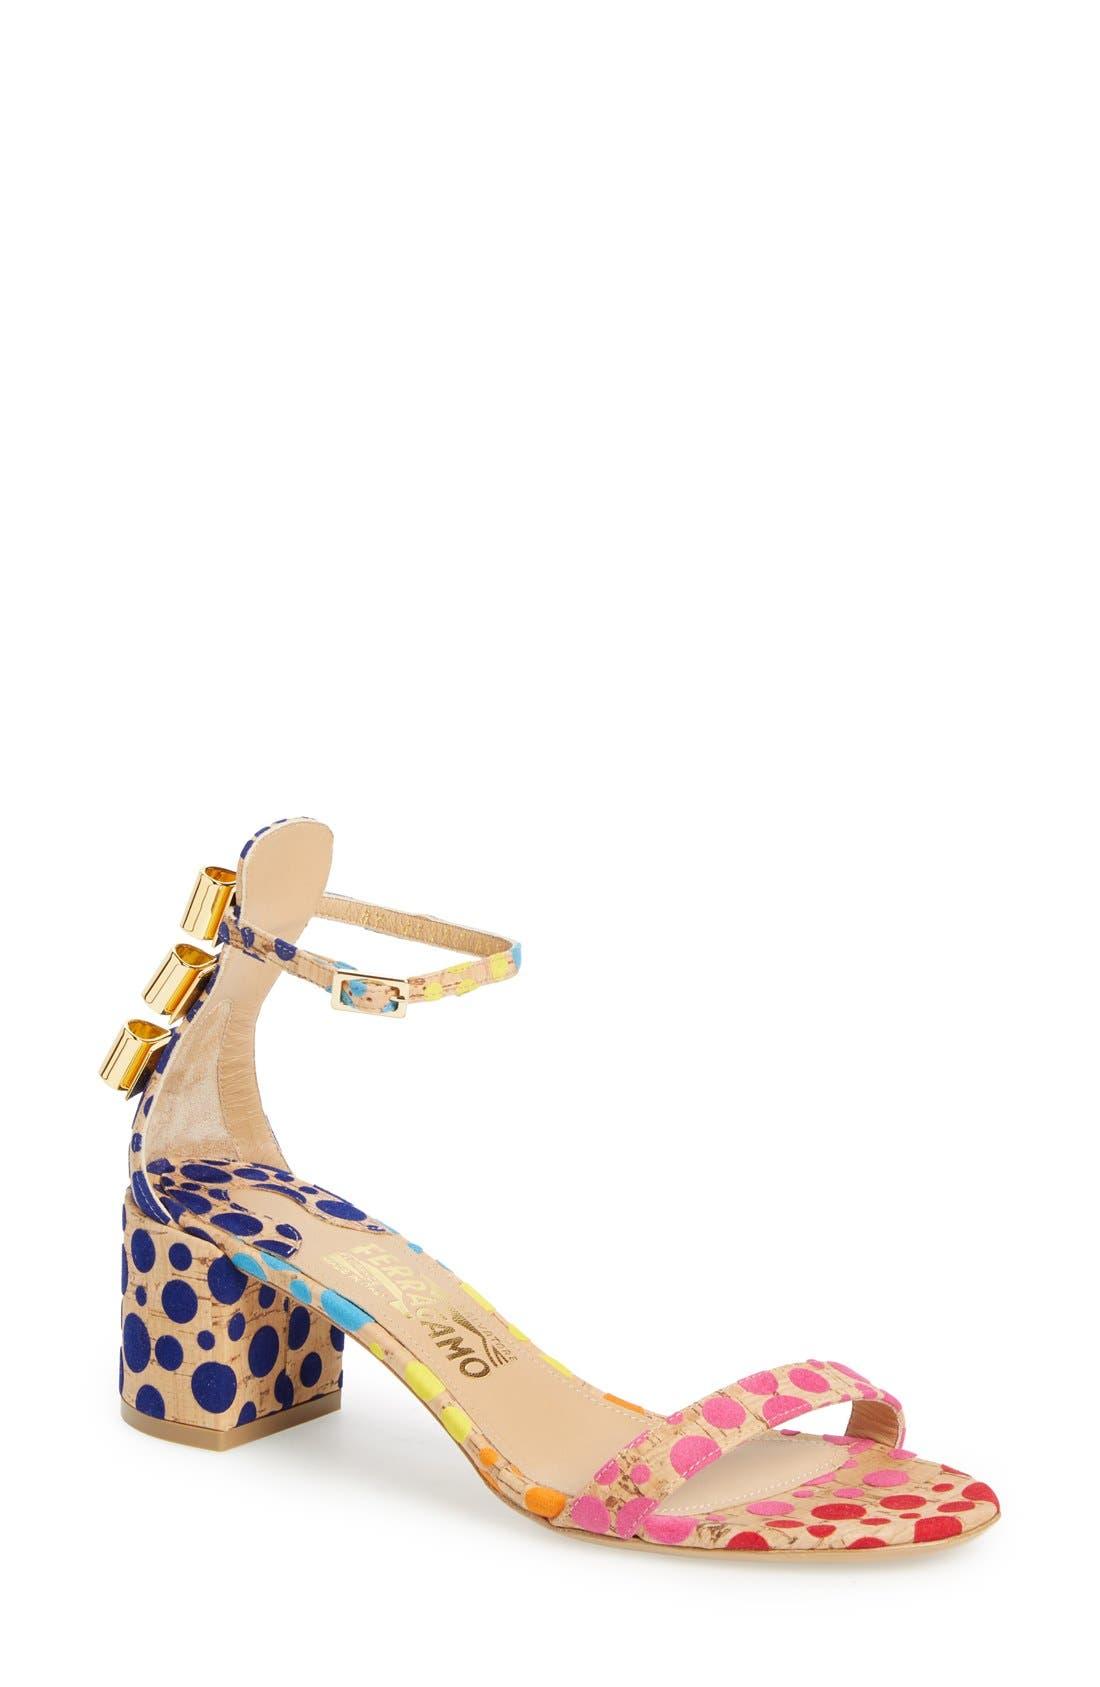 x Edgardo Osorio 'Connie' Ankle Strap Sandal, Main, color, 250